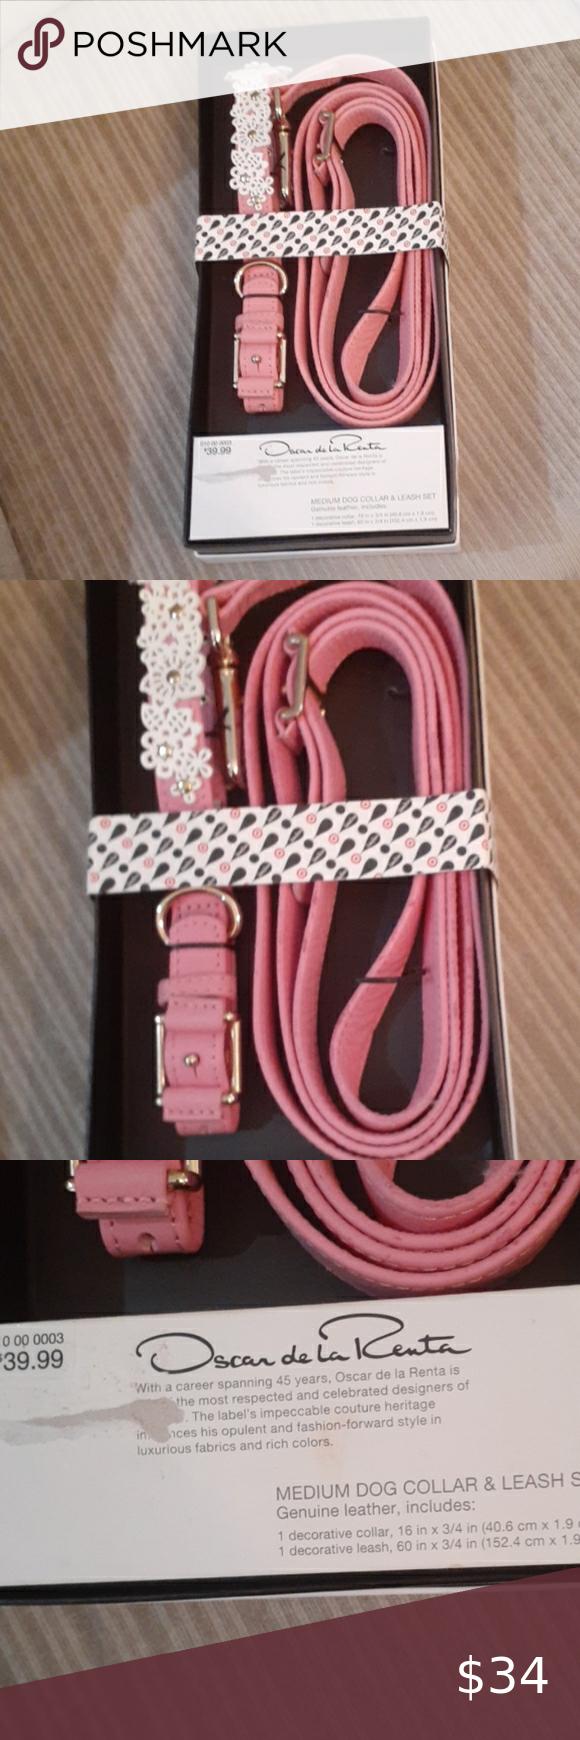 Oscar De La Renta Dog Collar And Leash Set Collar And Leash Oscar De La Renta Dog Collar